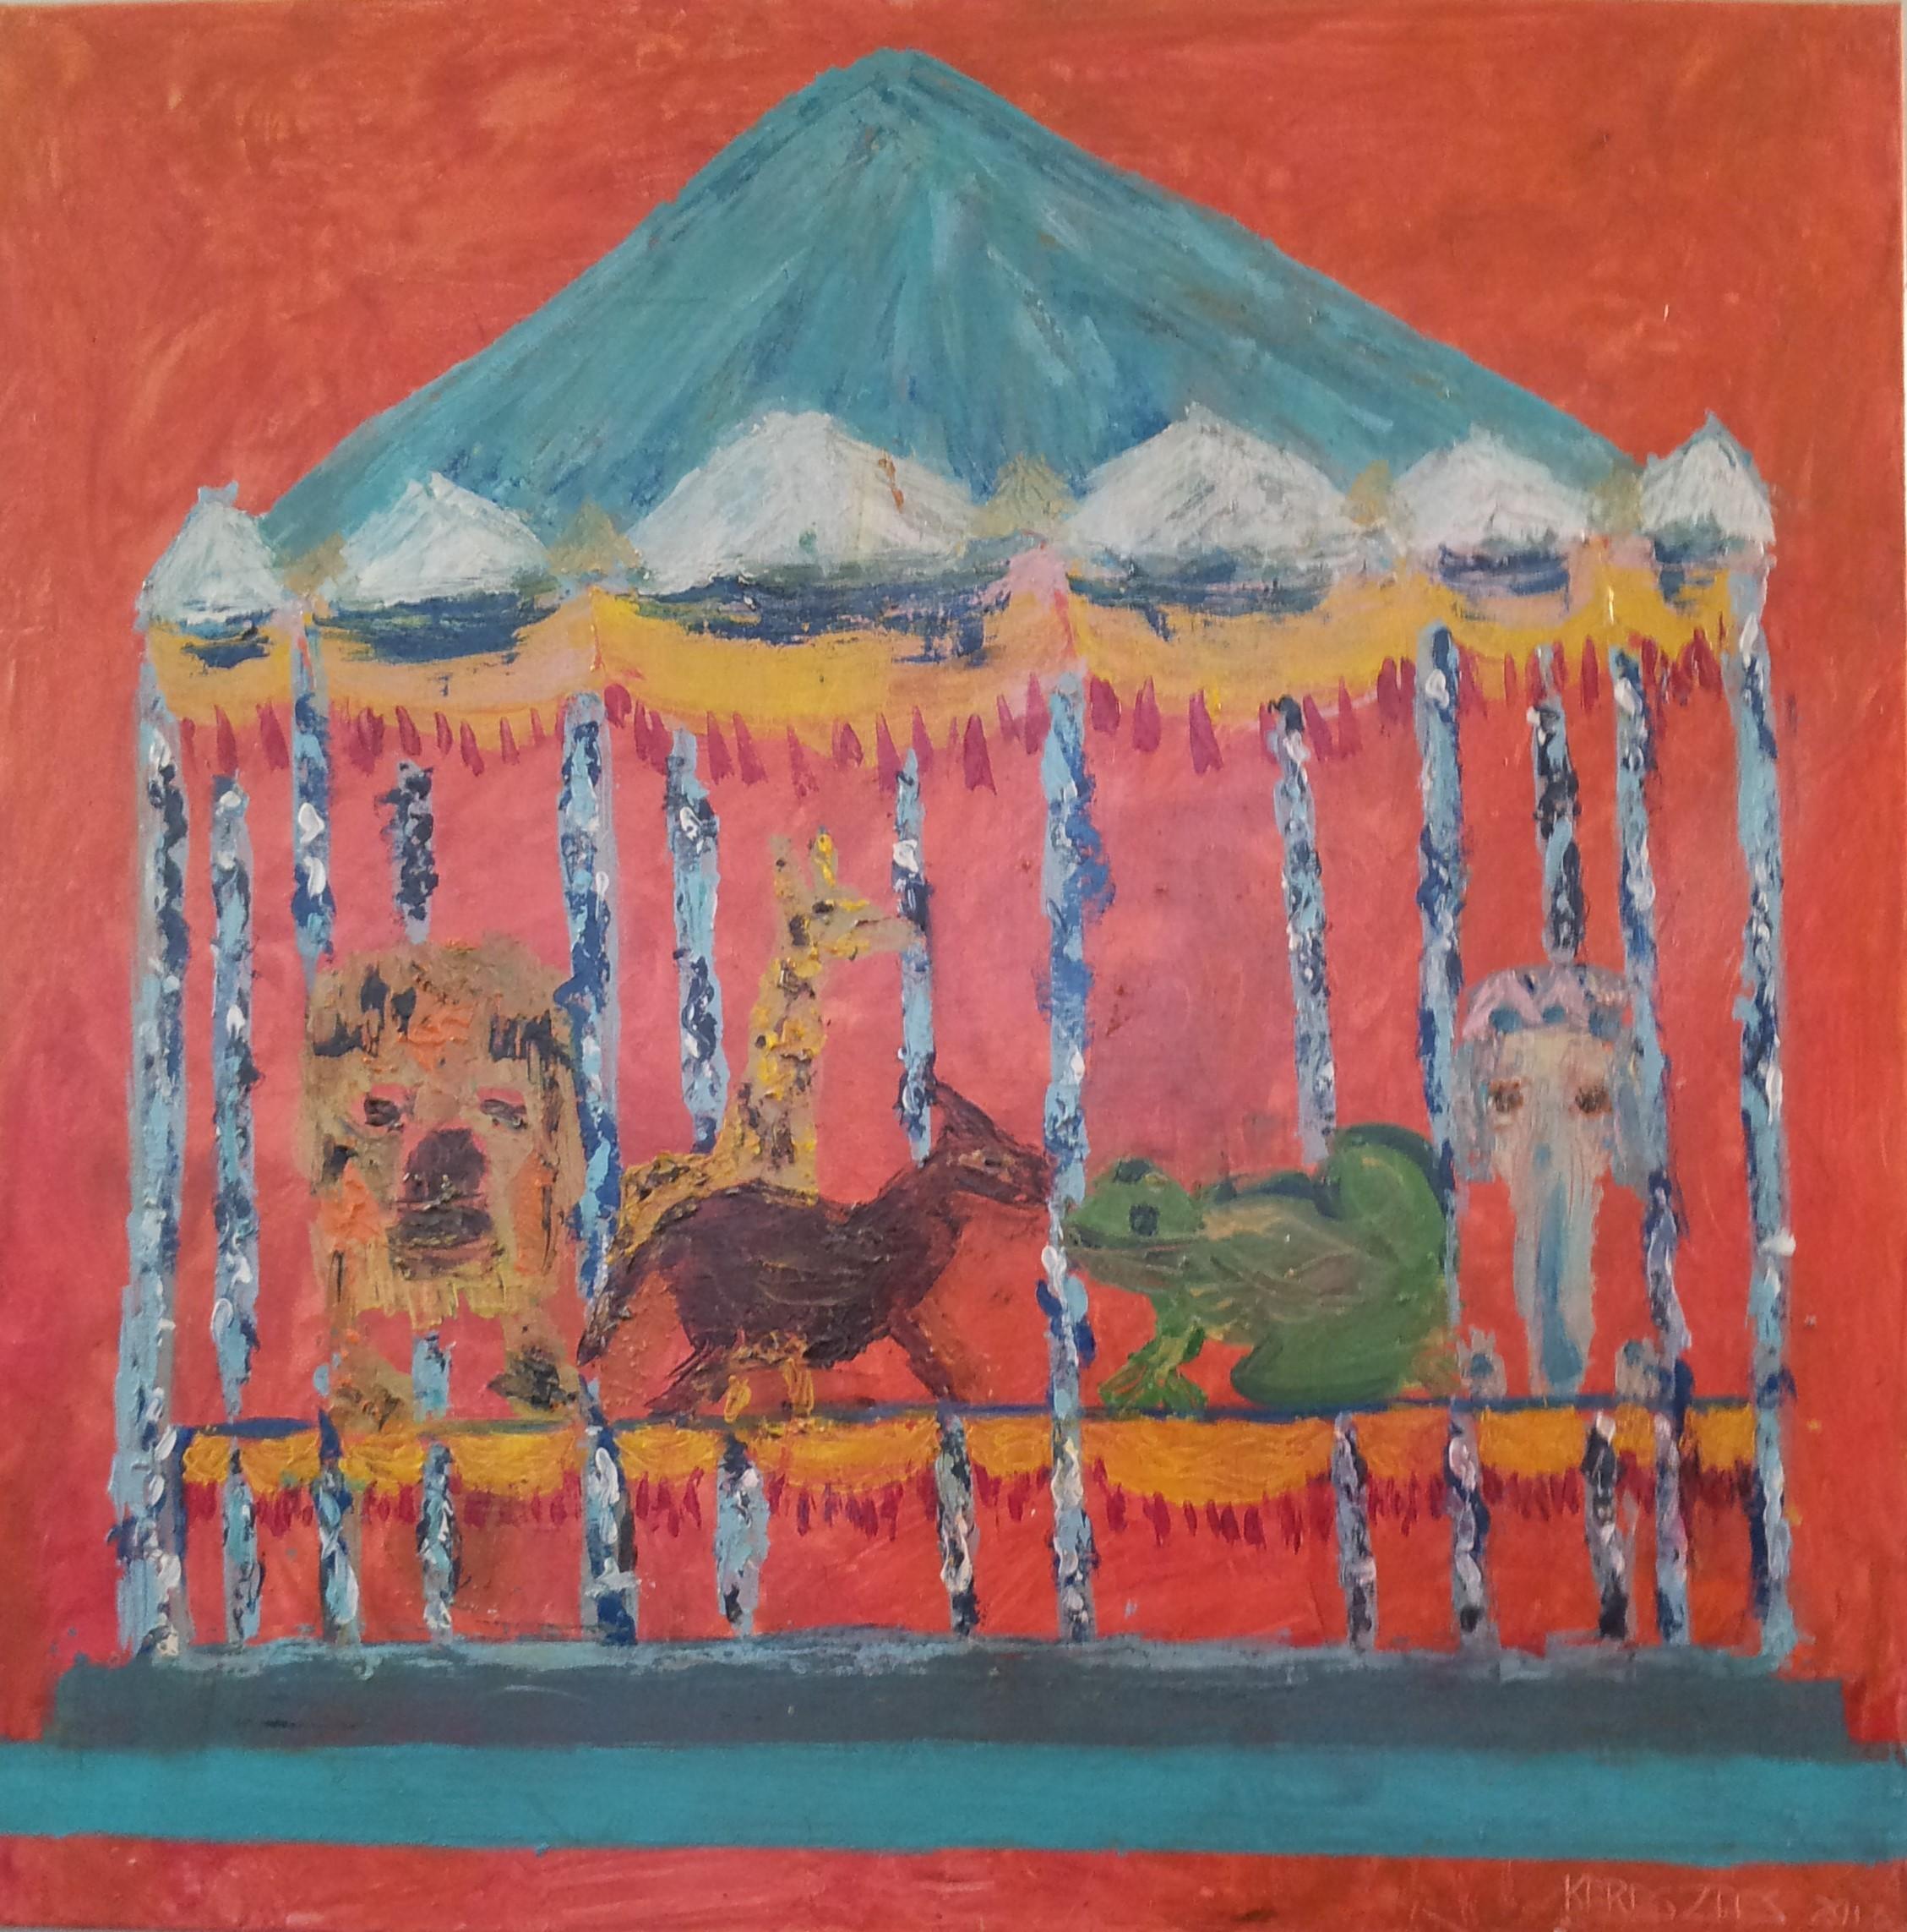 toile manege n°2 - magdalena keresztes, artiste peintre à amiens